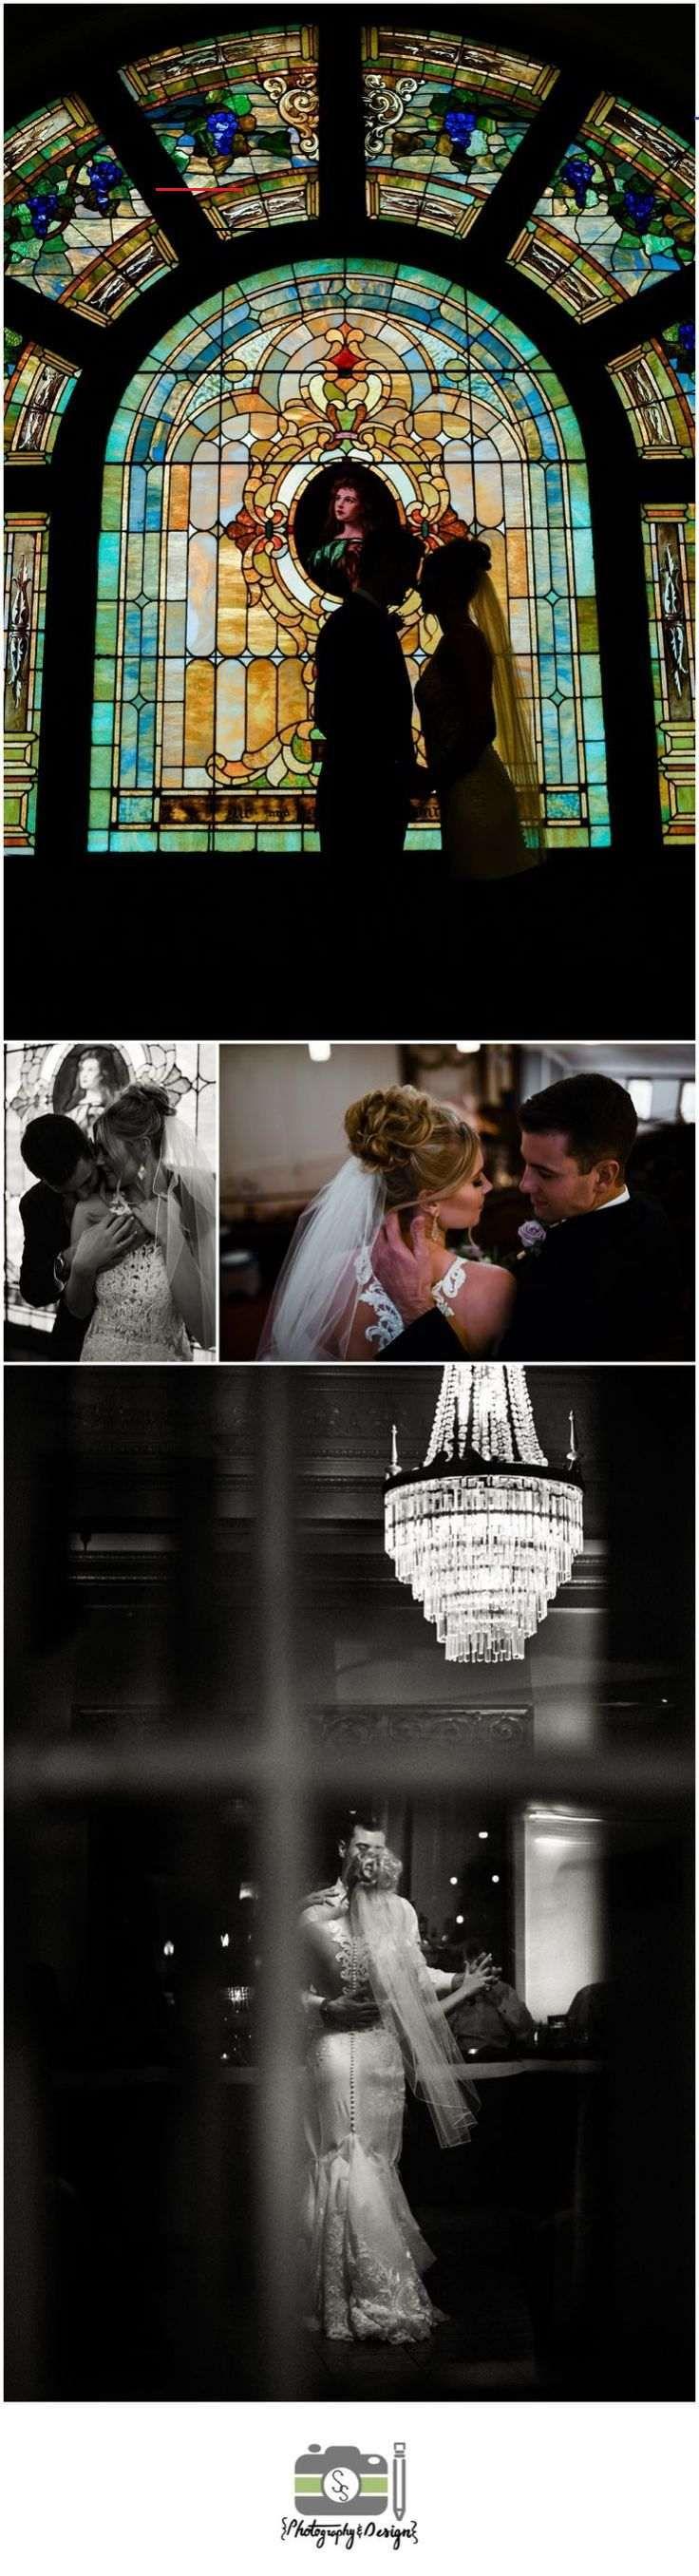 Romantic Church Wedding Photos [ad_1]  Boise Wedding Photographer, Id... #church #photos #romantic #wedding<br>